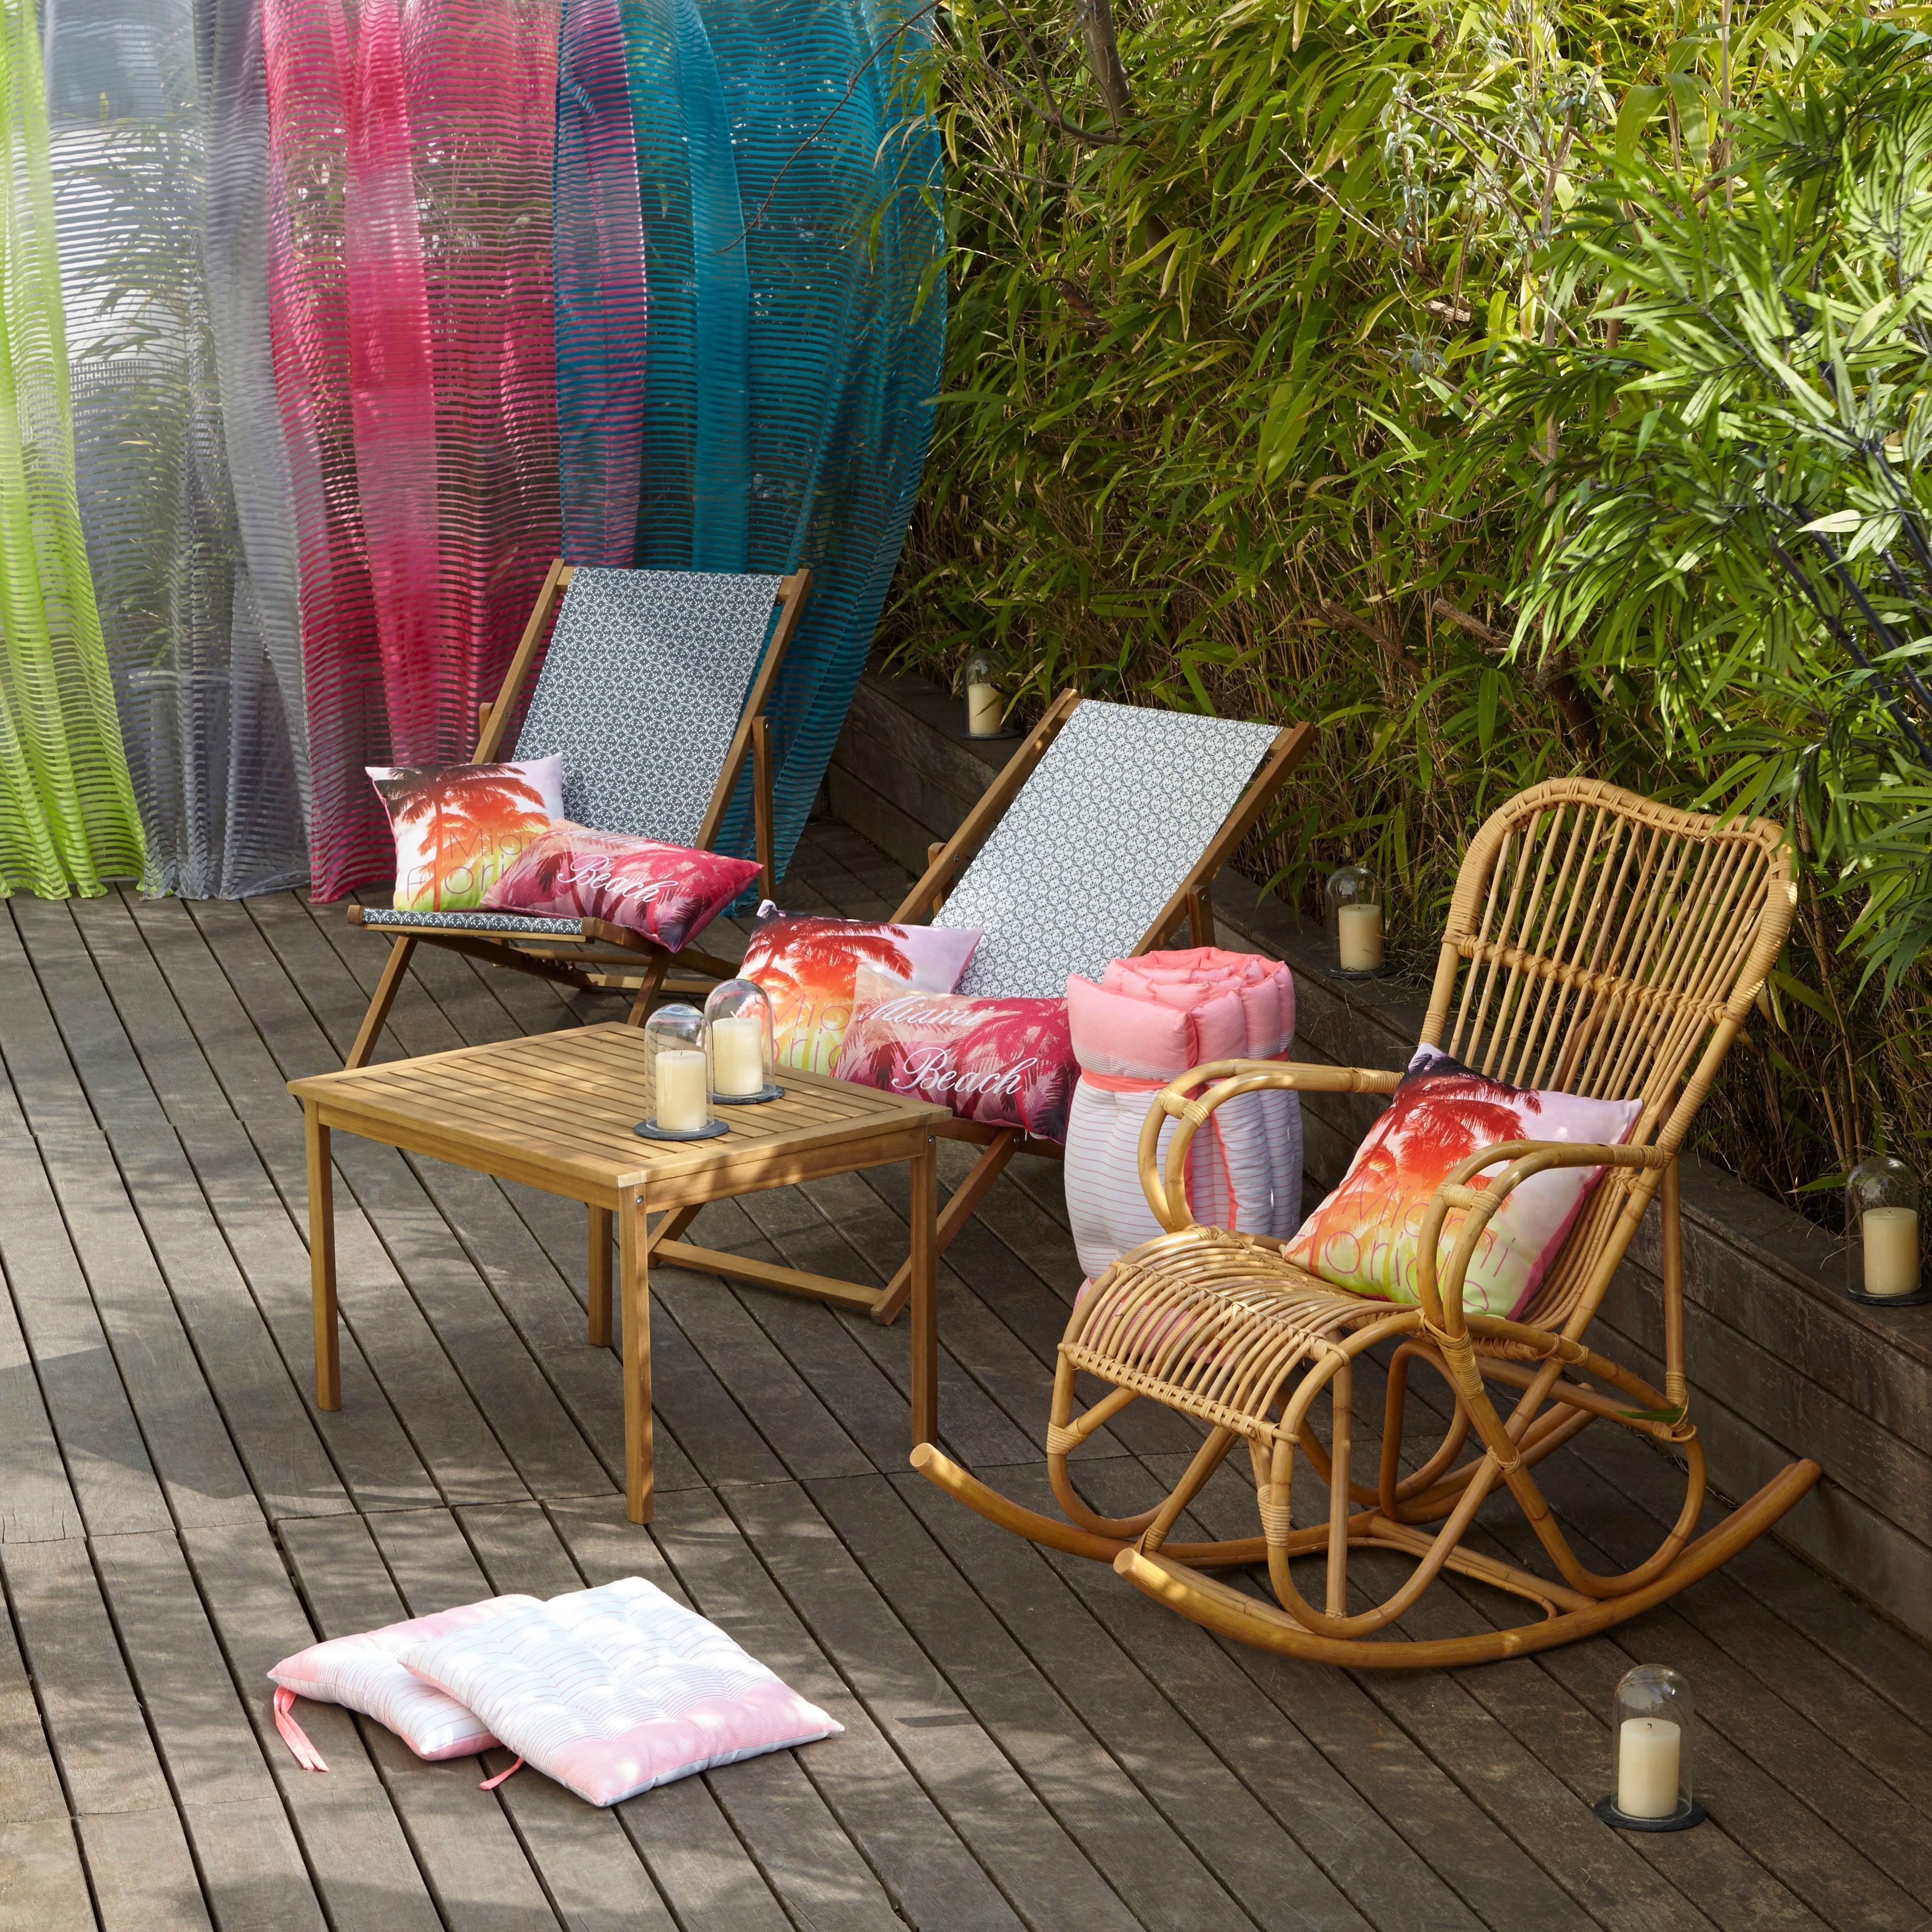 tristan fauteuil rocking chair en rotin naturel alin a jardins ext rieurs pinterest. Black Bedroom Furniture Sets. Home Design Ideas